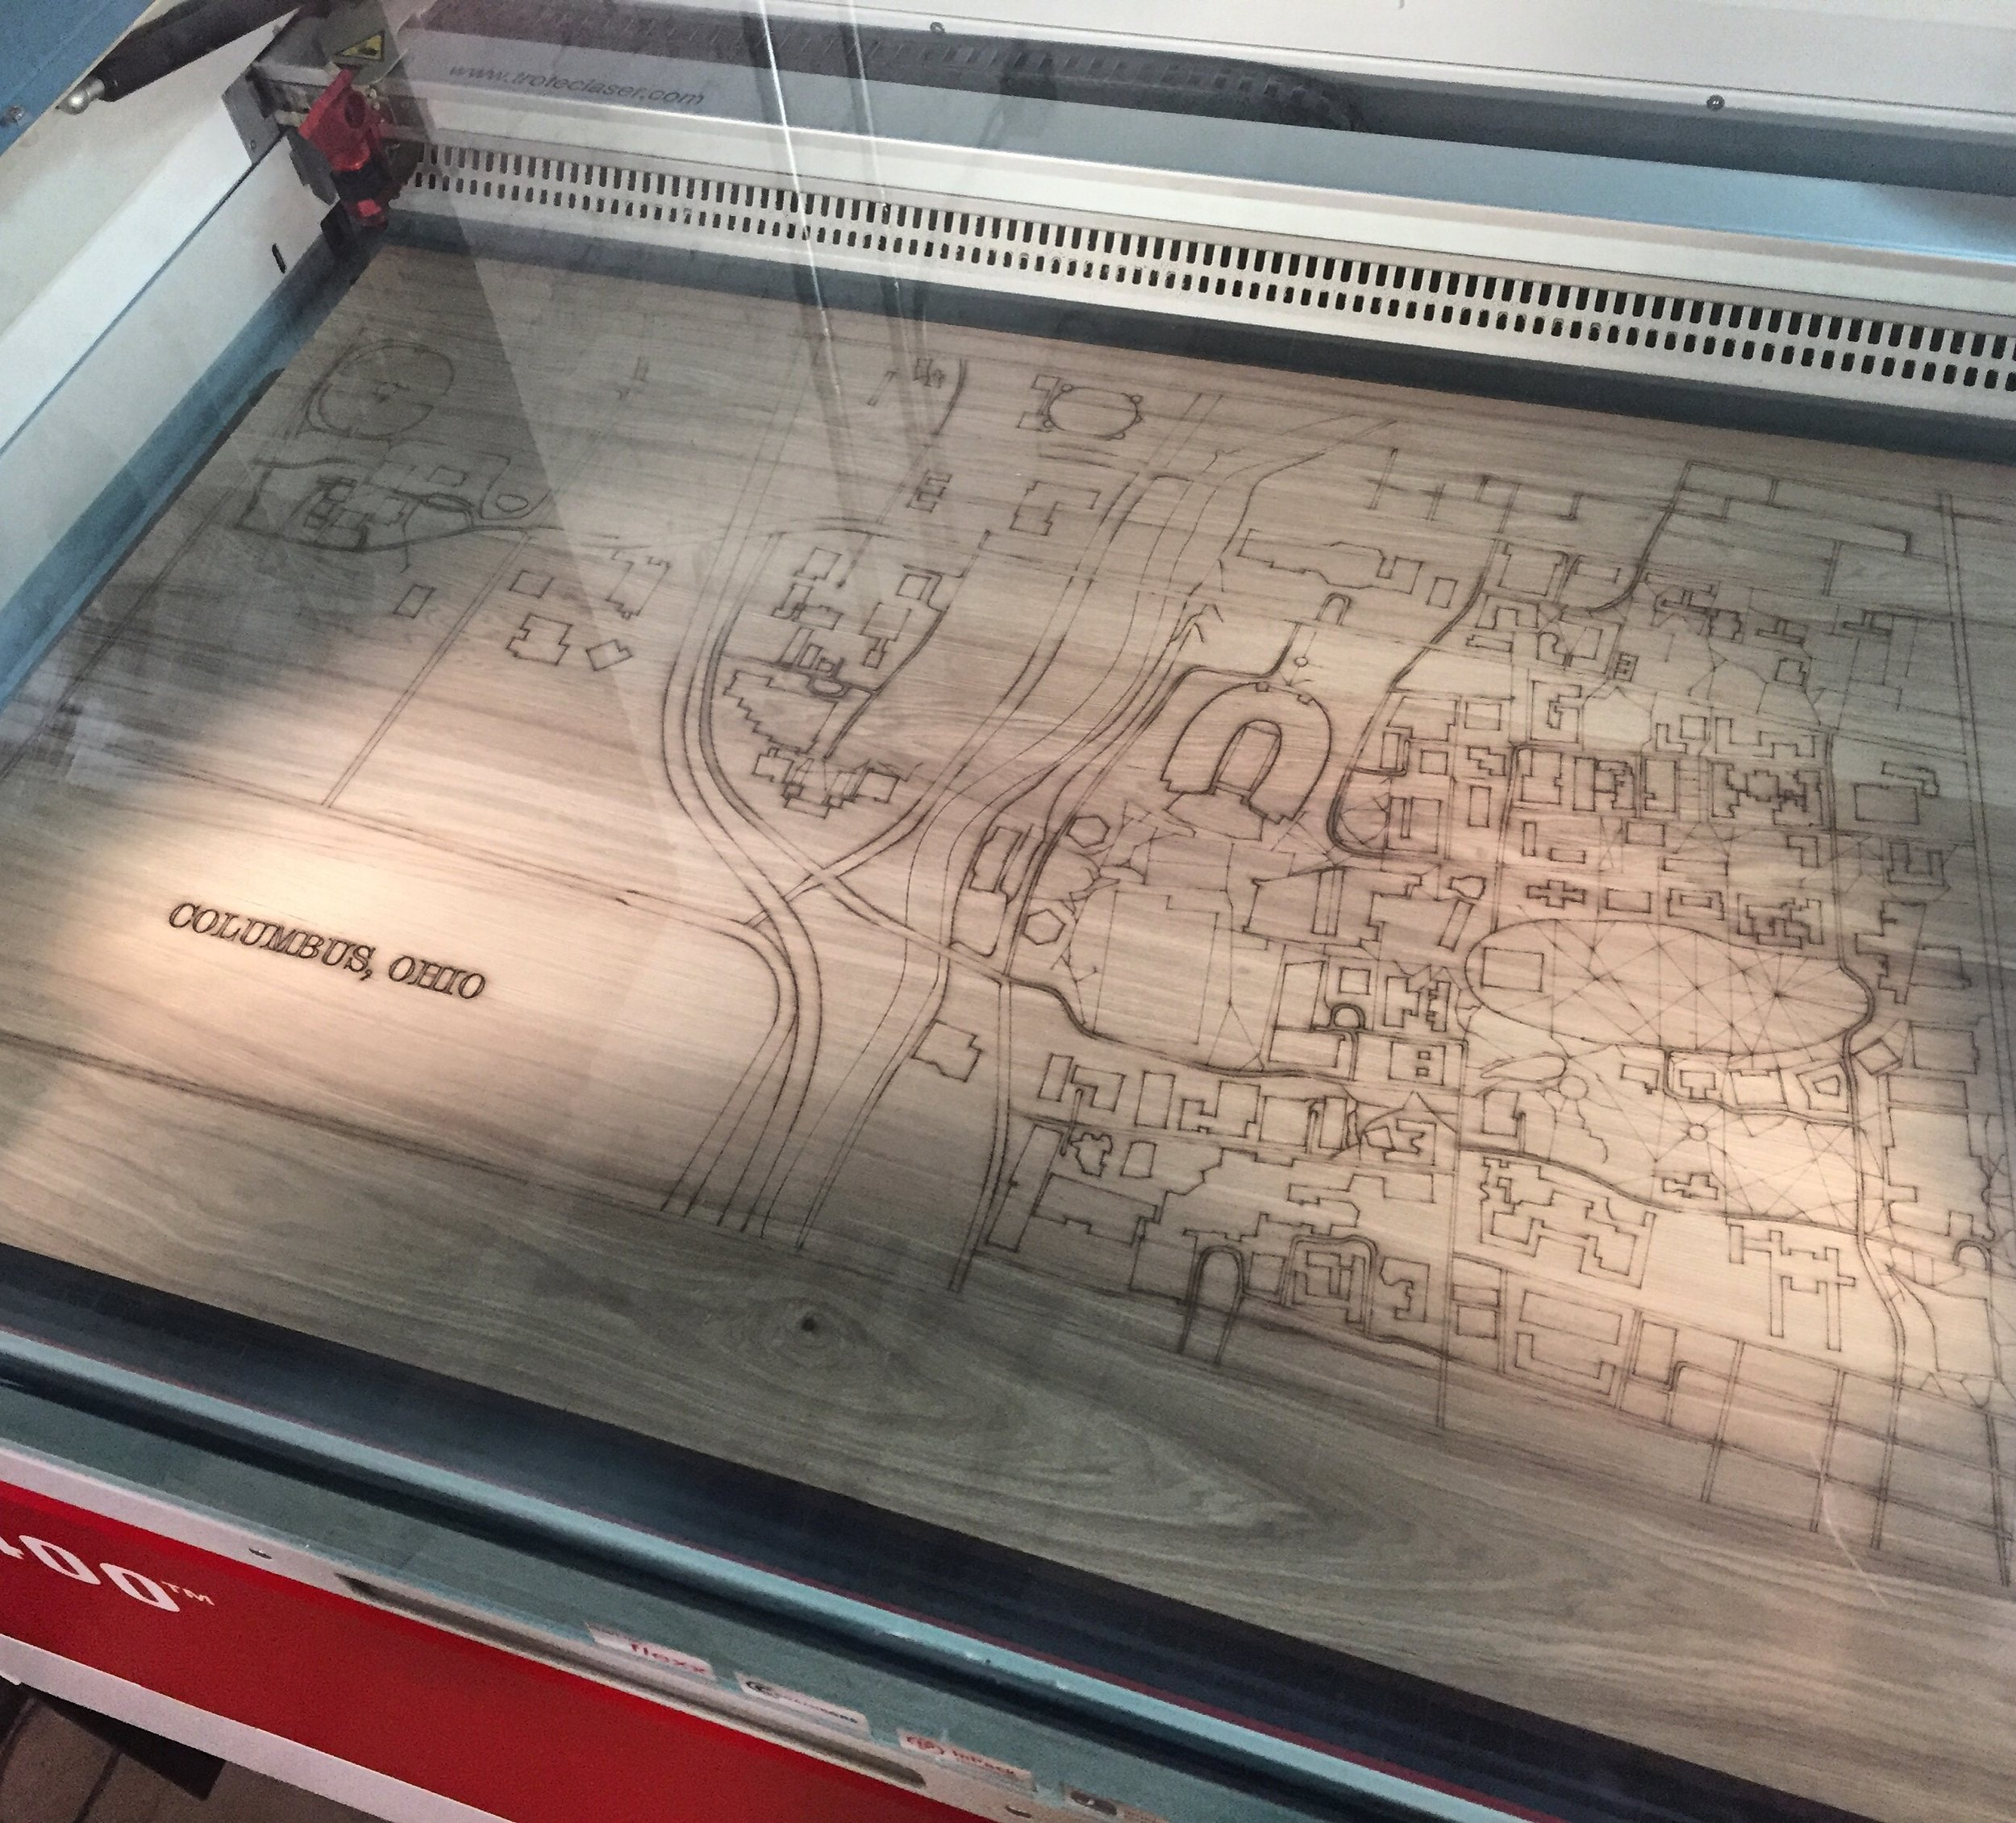 Laser Engraved Map of OSU Campus, Columbus, Ohio